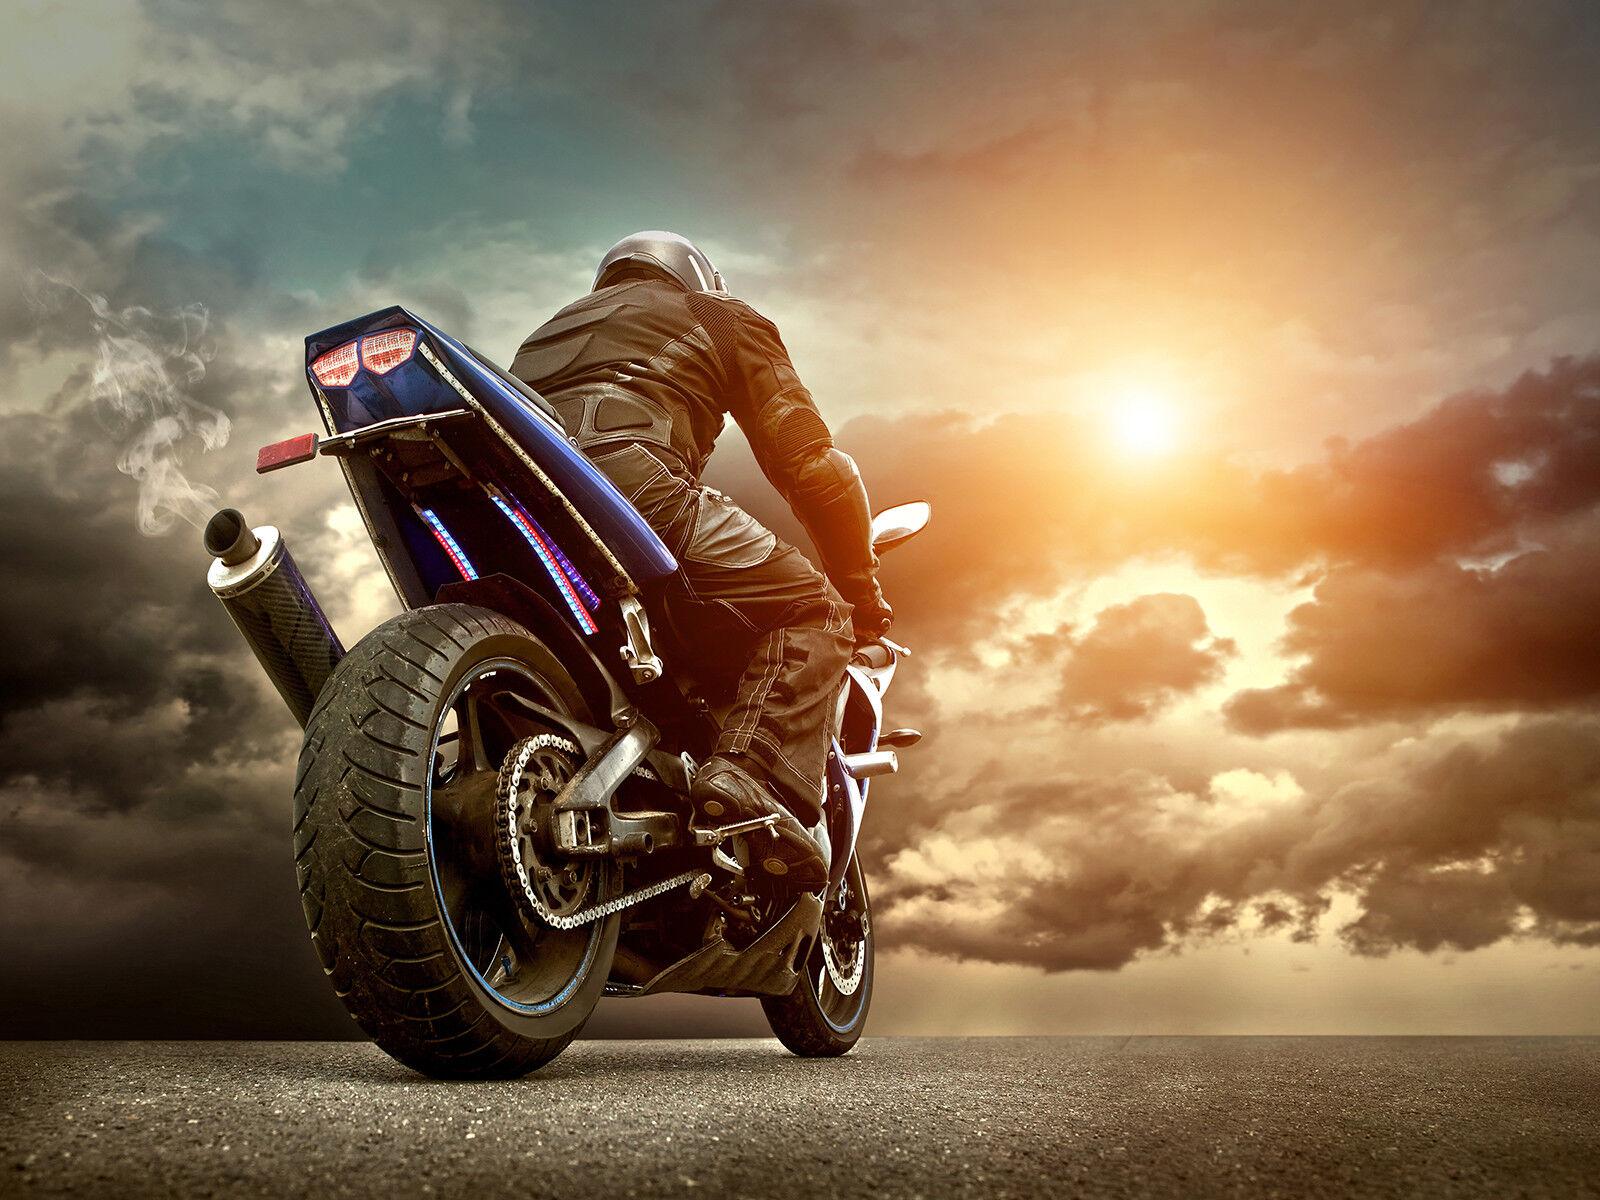 Verre Trempé Impression Impression Impression Photo Wall Art Photo motocycliste Racing Prizma GWA0335   Emballage élégant Et Robuste    2019    En Ligne  fe493c